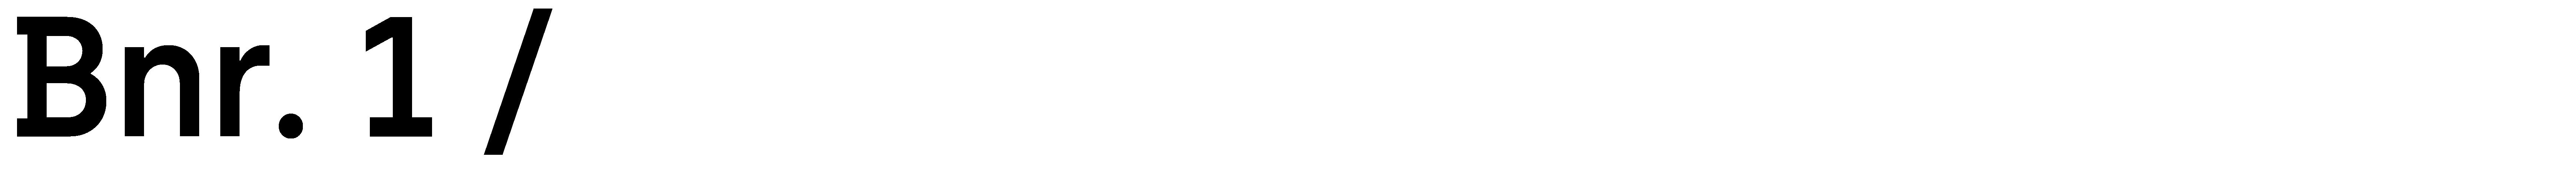 9450ba60-d7f5-11eb-83e9-413054c15885.png